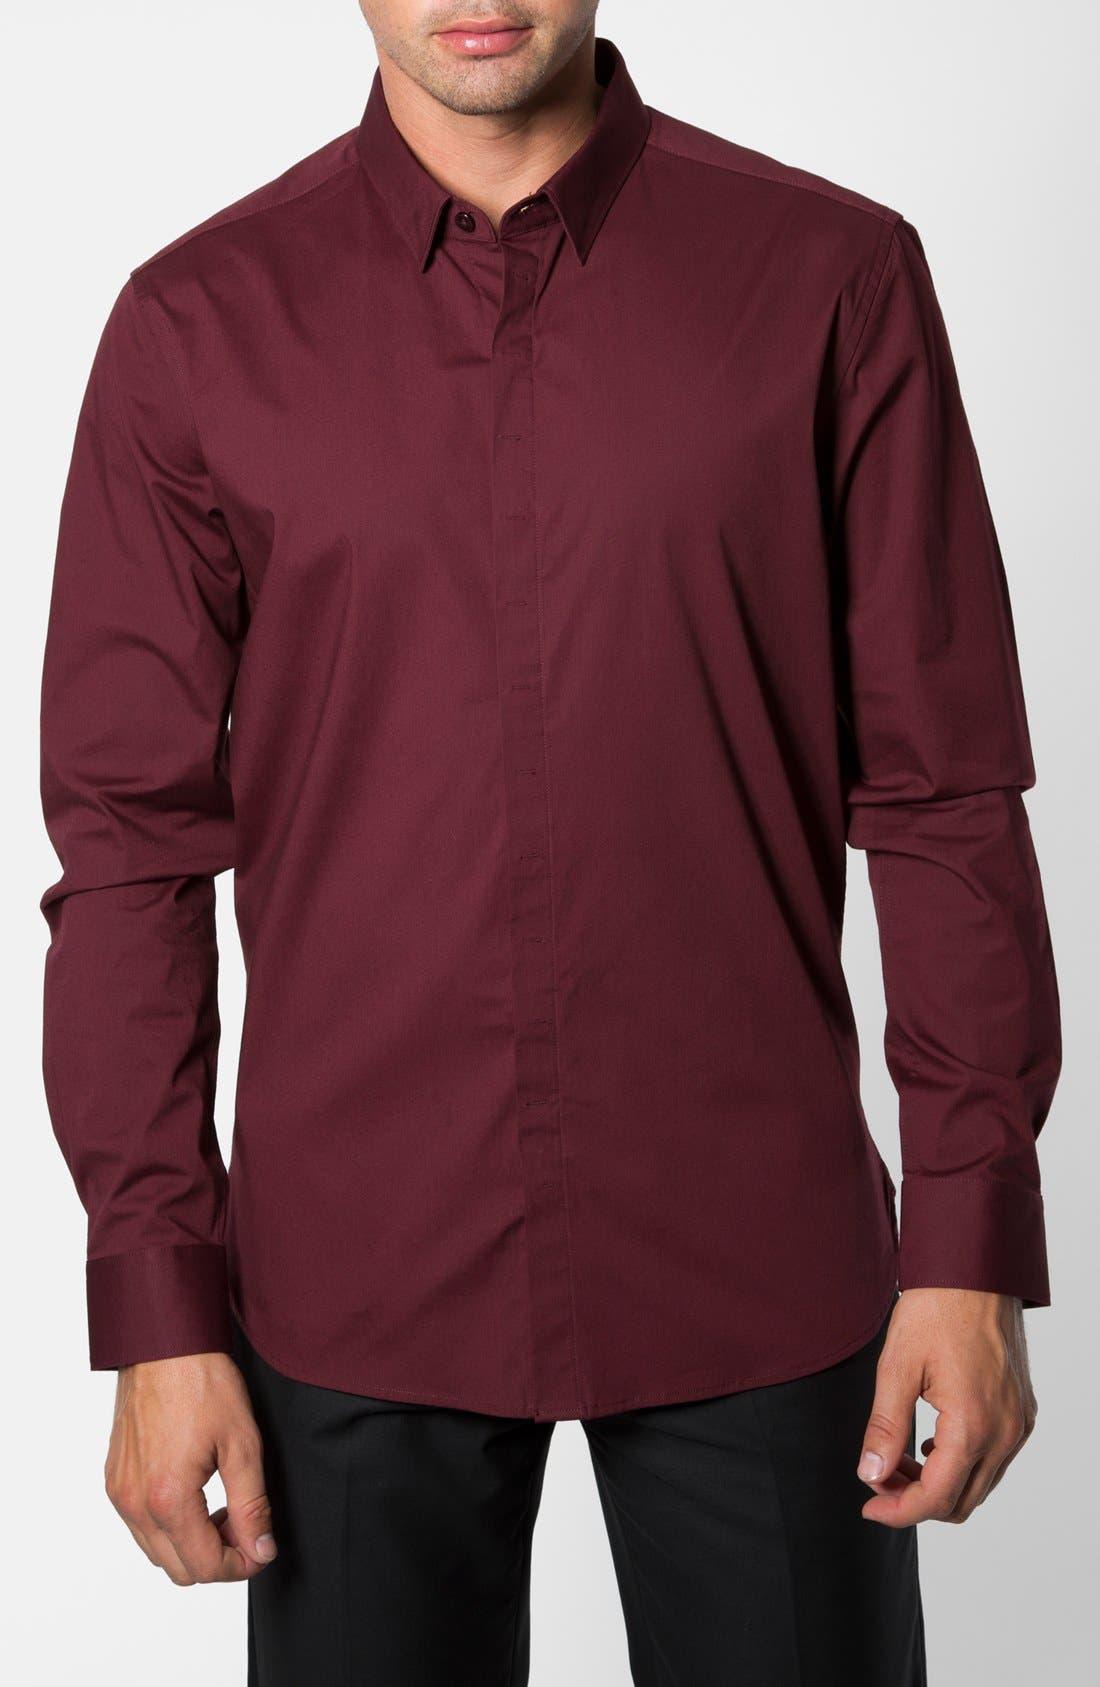 'Peace Train' Trim Fit Woven Shirt,                             Main thumbnail 1, color,                             Maroon